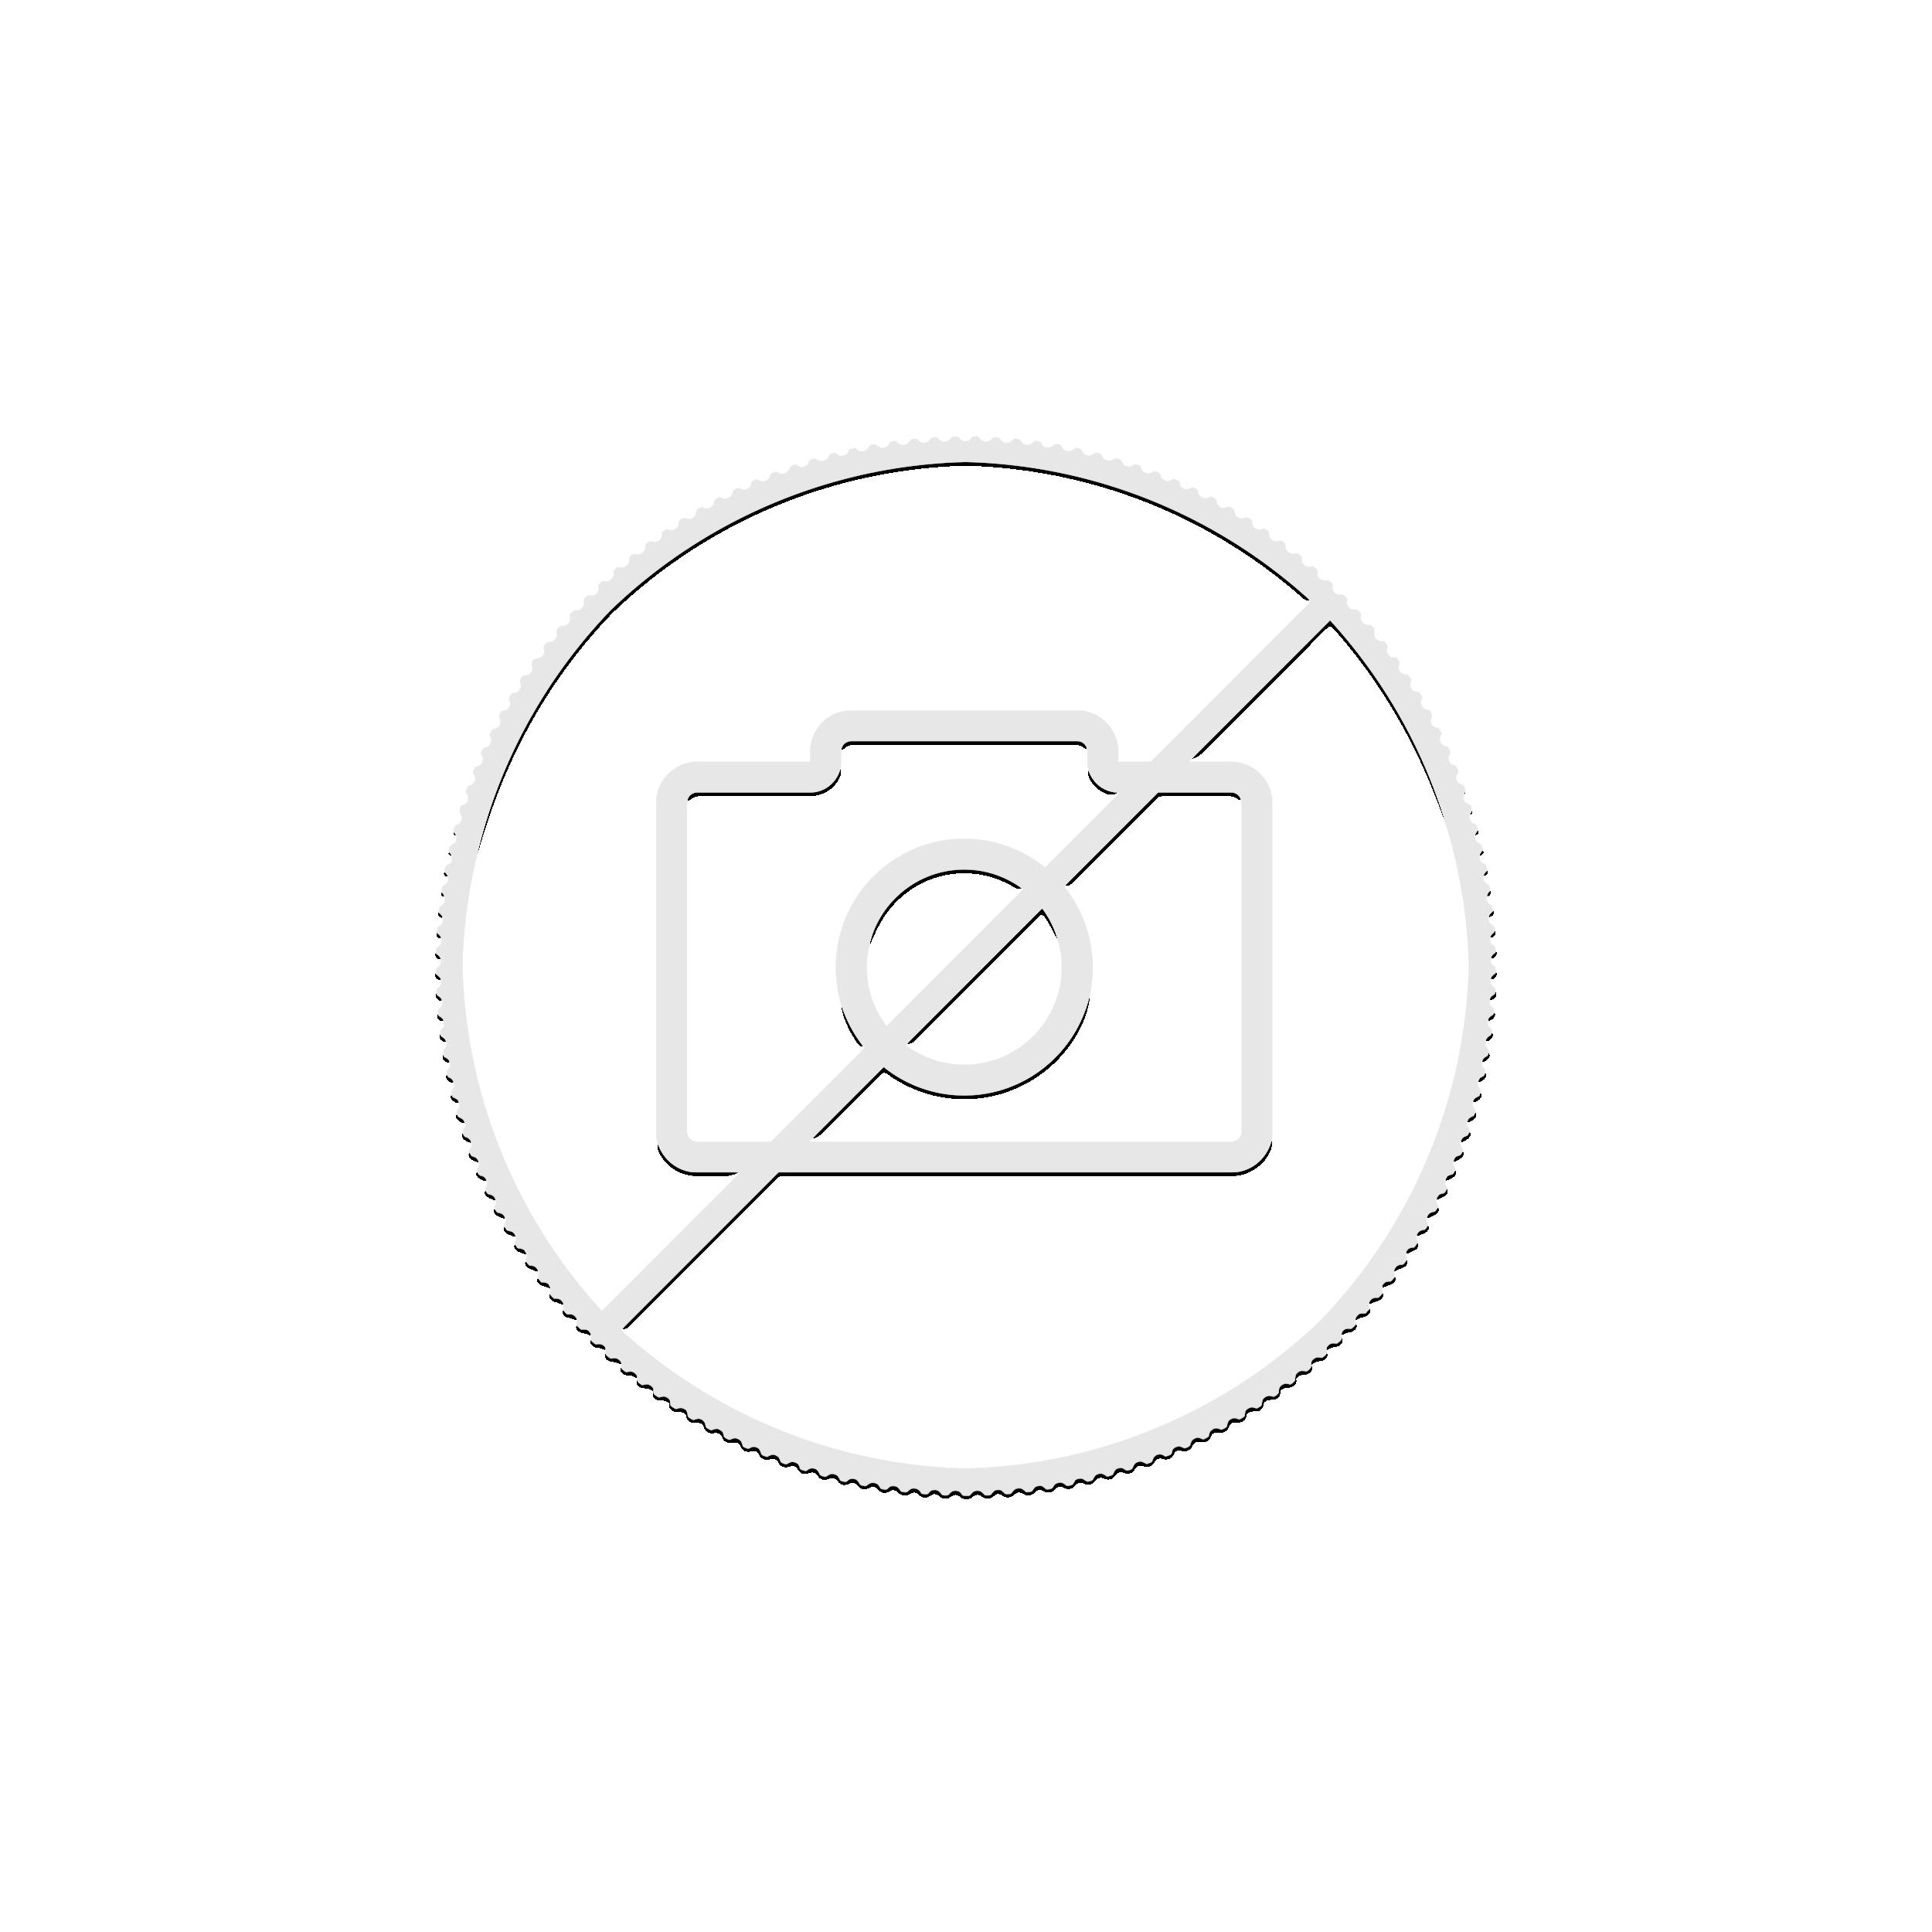 1 troy ounce zilveren munt Wombat 2021 - achterkant